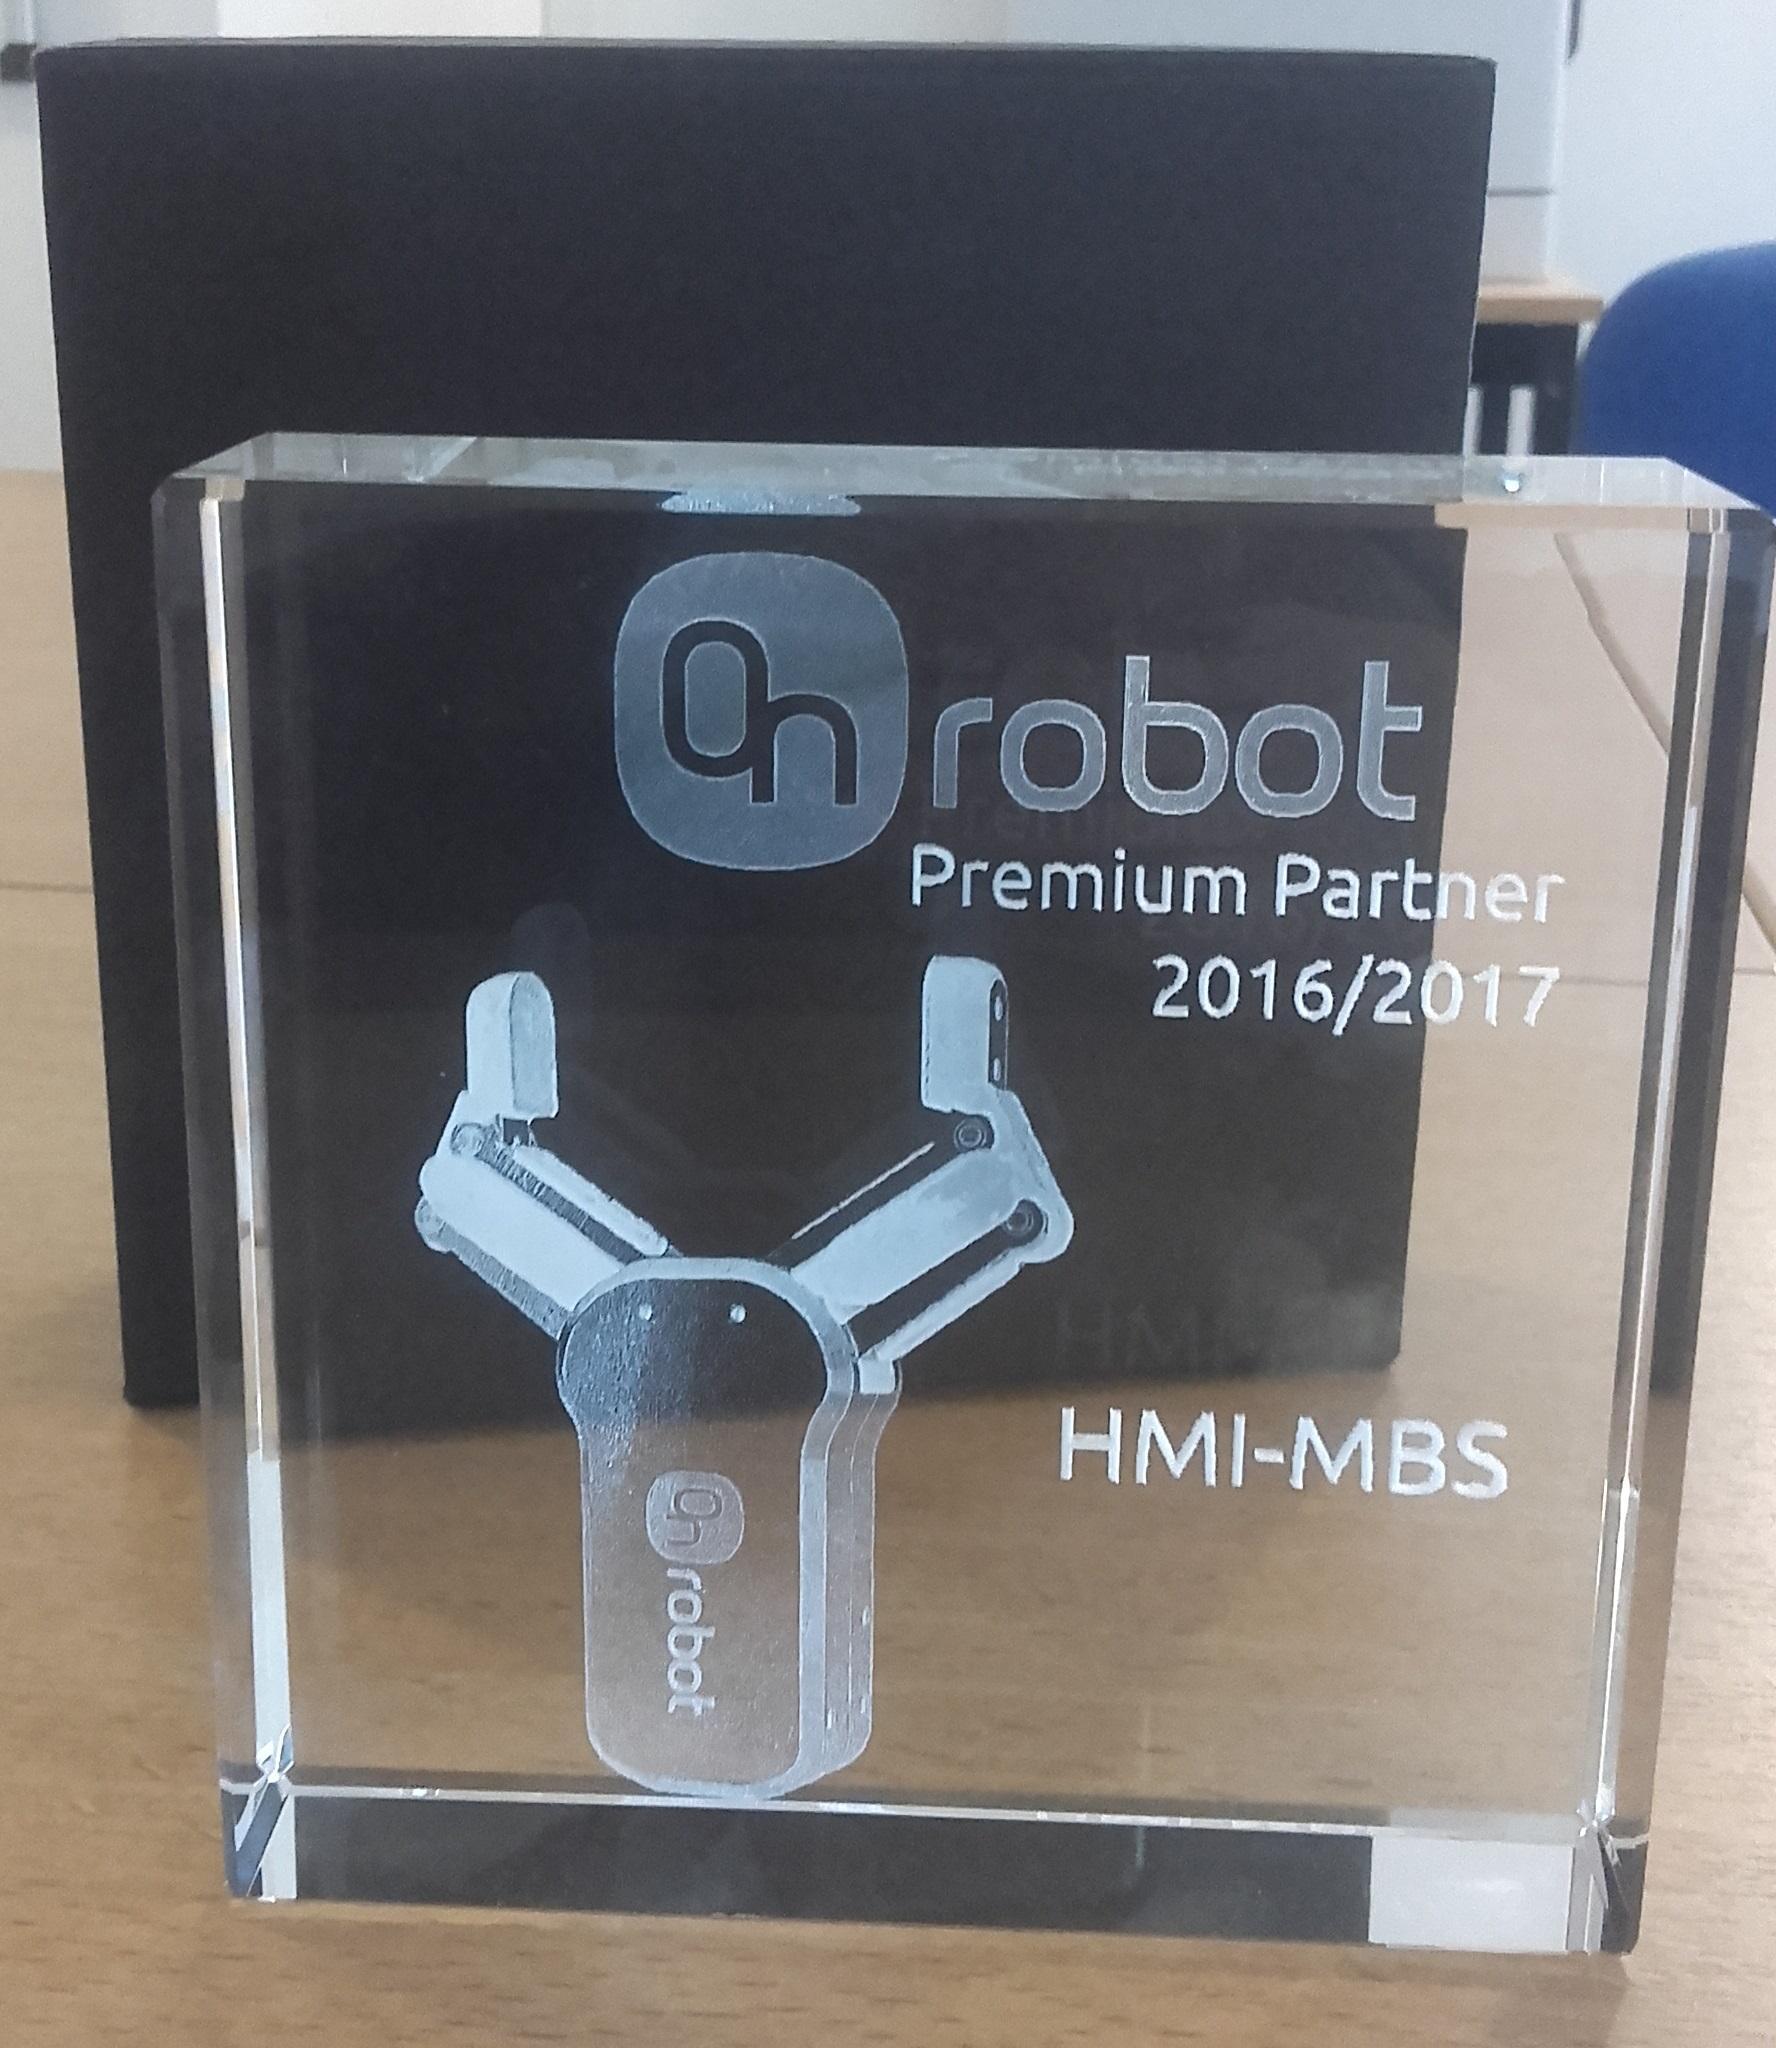 prix ON ROBOT PREMIUM PARTNER HMI